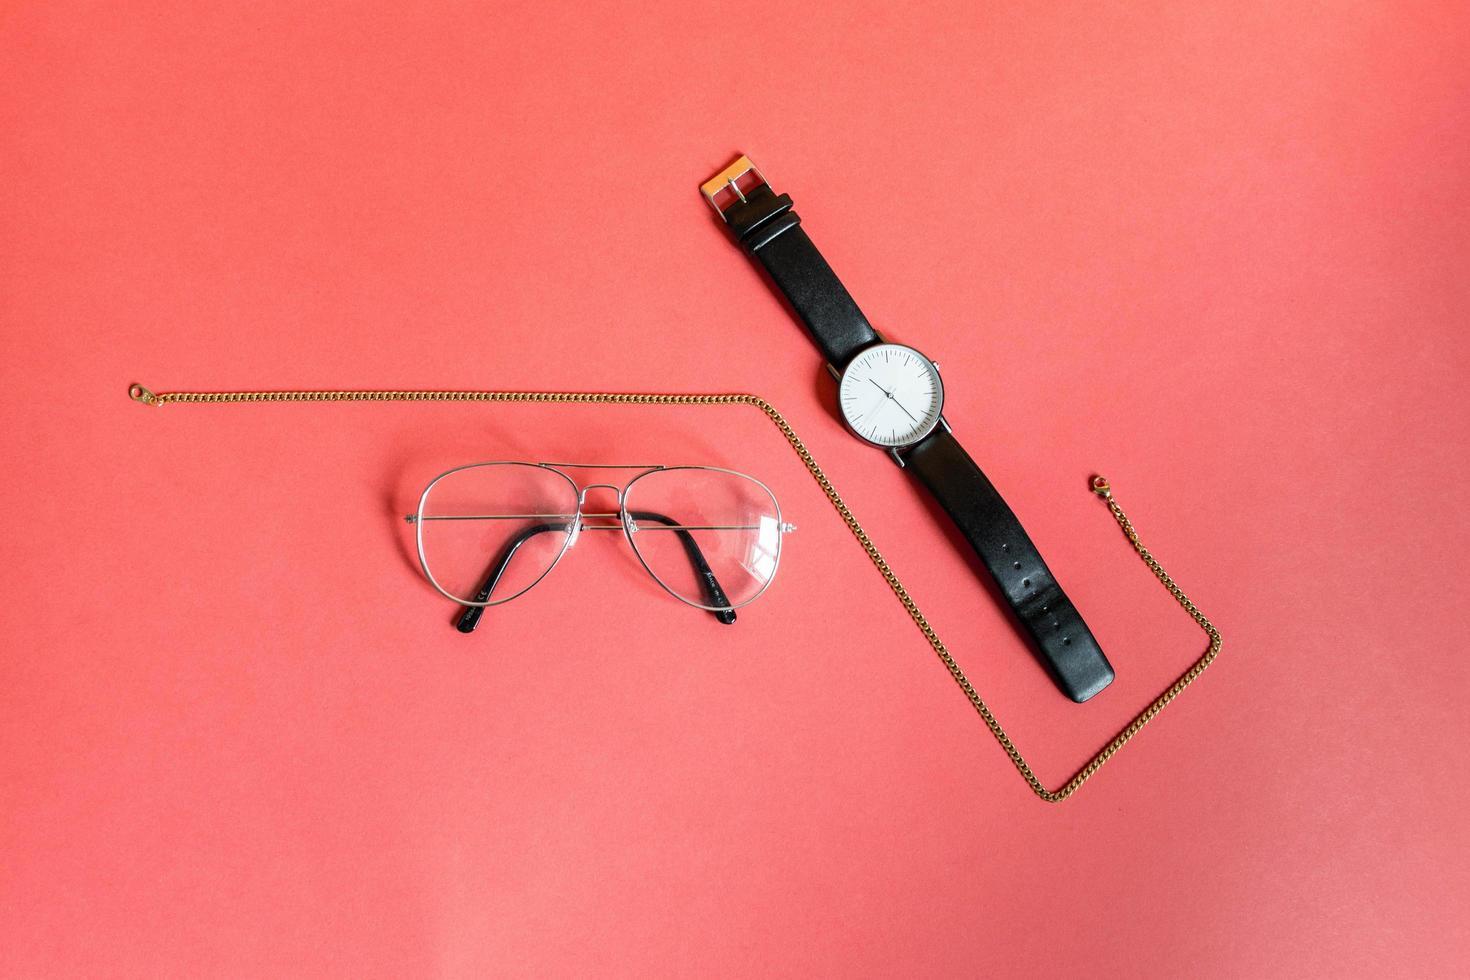 gouden ketting, bril en horloge foto